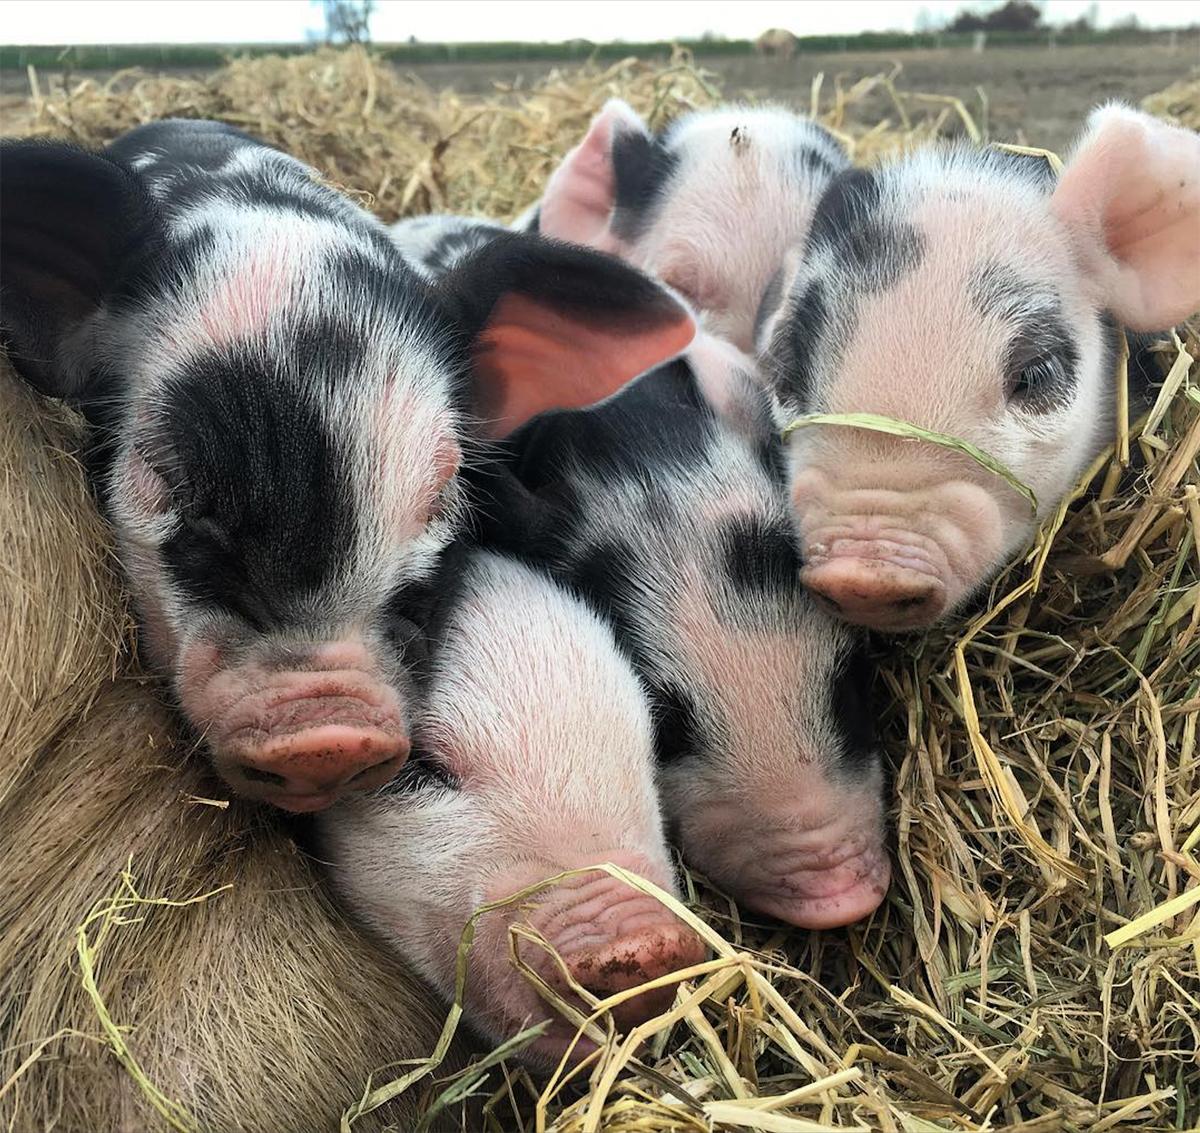 Some of Massa Organics' piglets.